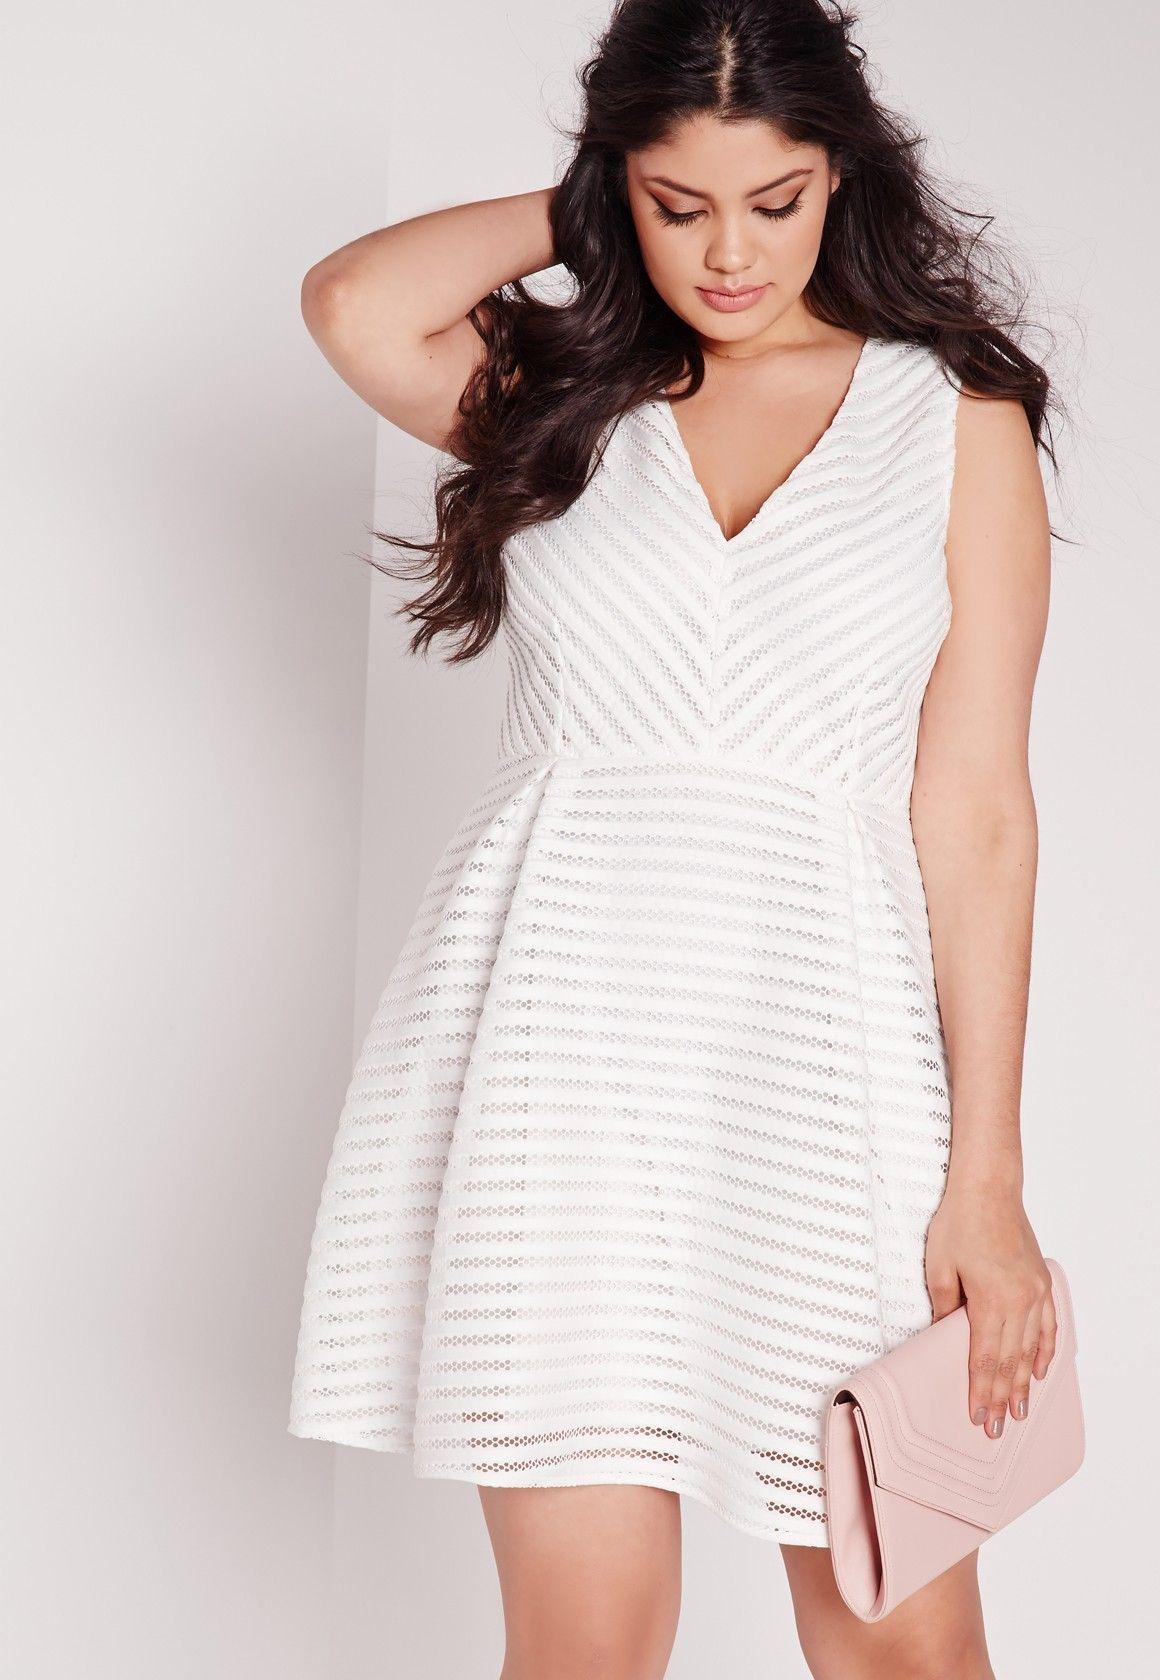 Missguided Plus Size Skater Wrap Dress White Wrap Dress White Overlay Dress Missguided Dress [ 1680 x 1160 Pixel ]